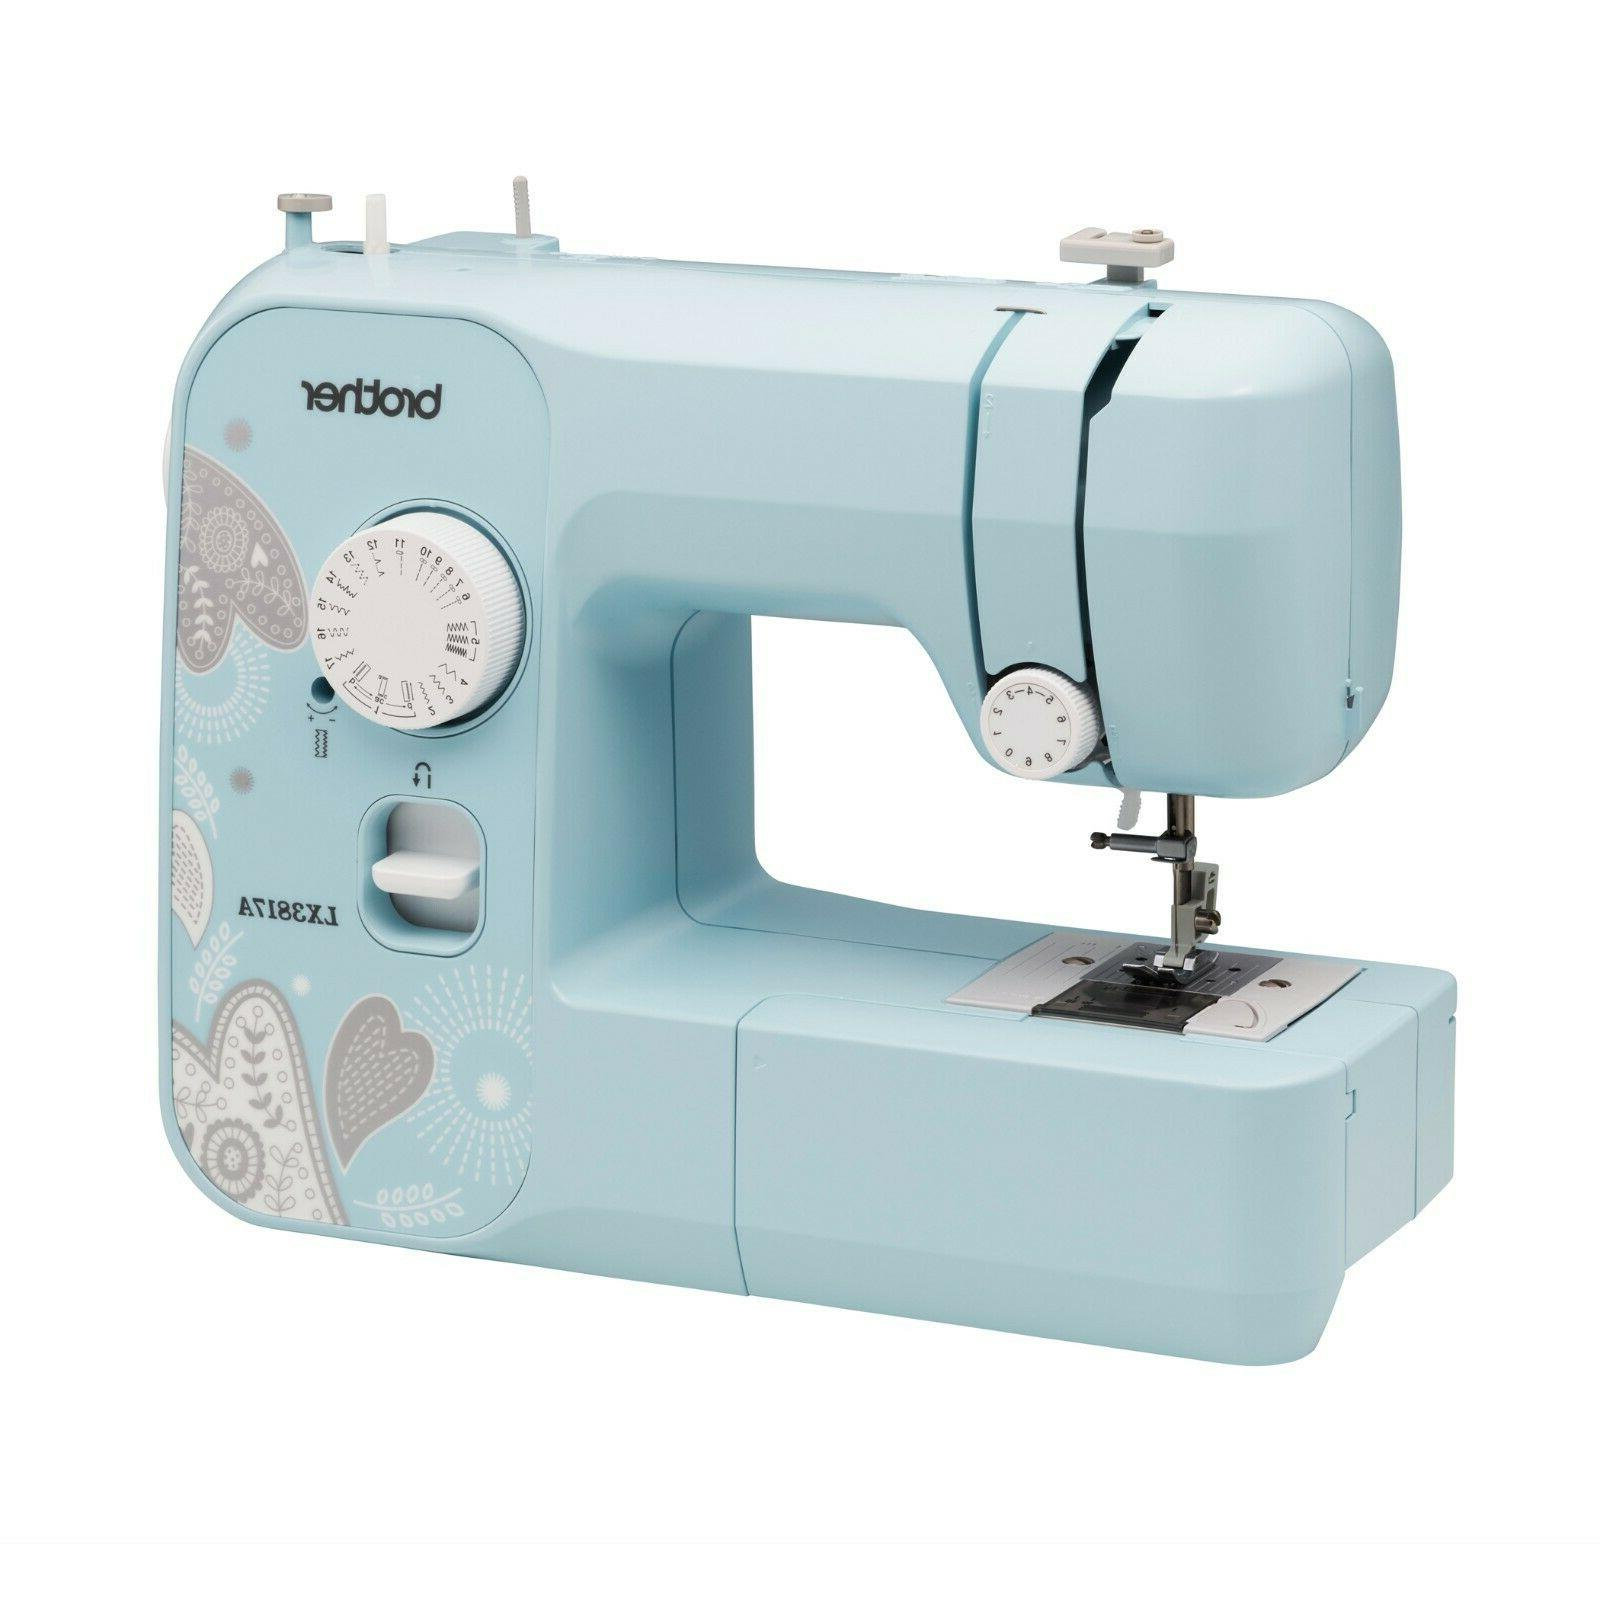 lx3817a aqua 17 stitch full size sewing